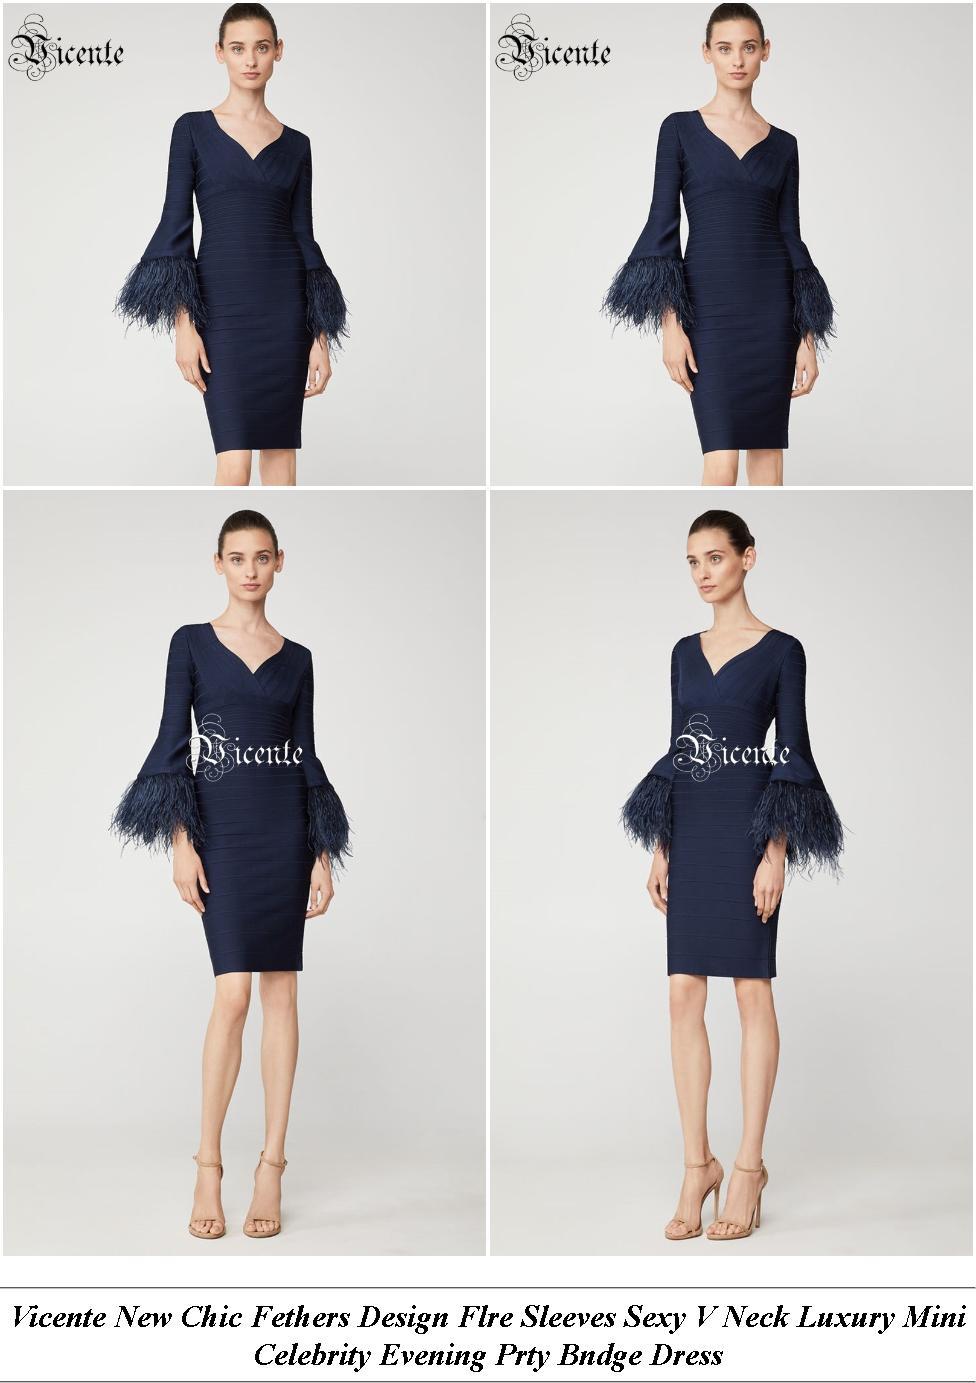 Cheap Maxi Dresses Uk Petite - Super Clearance Sale - Affordale Evening Dresses Duai